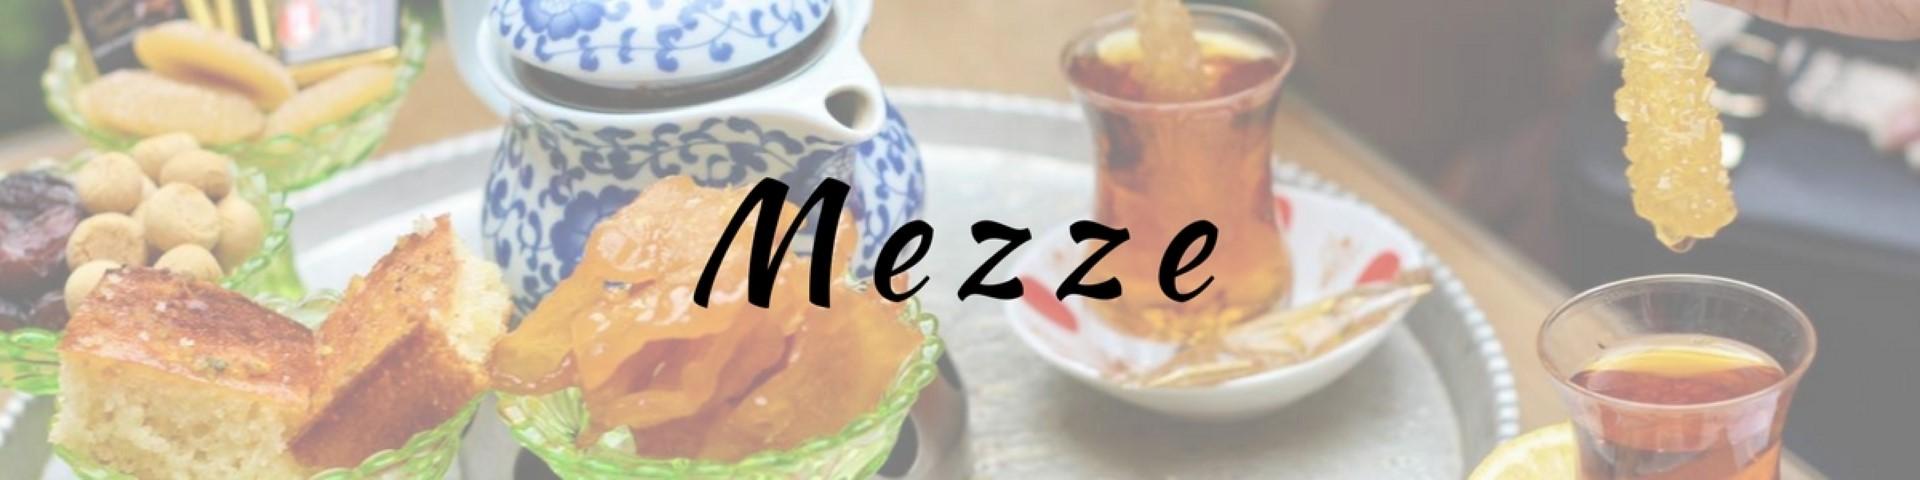 mezze best restaurants in warsaw best hummus in warsaw